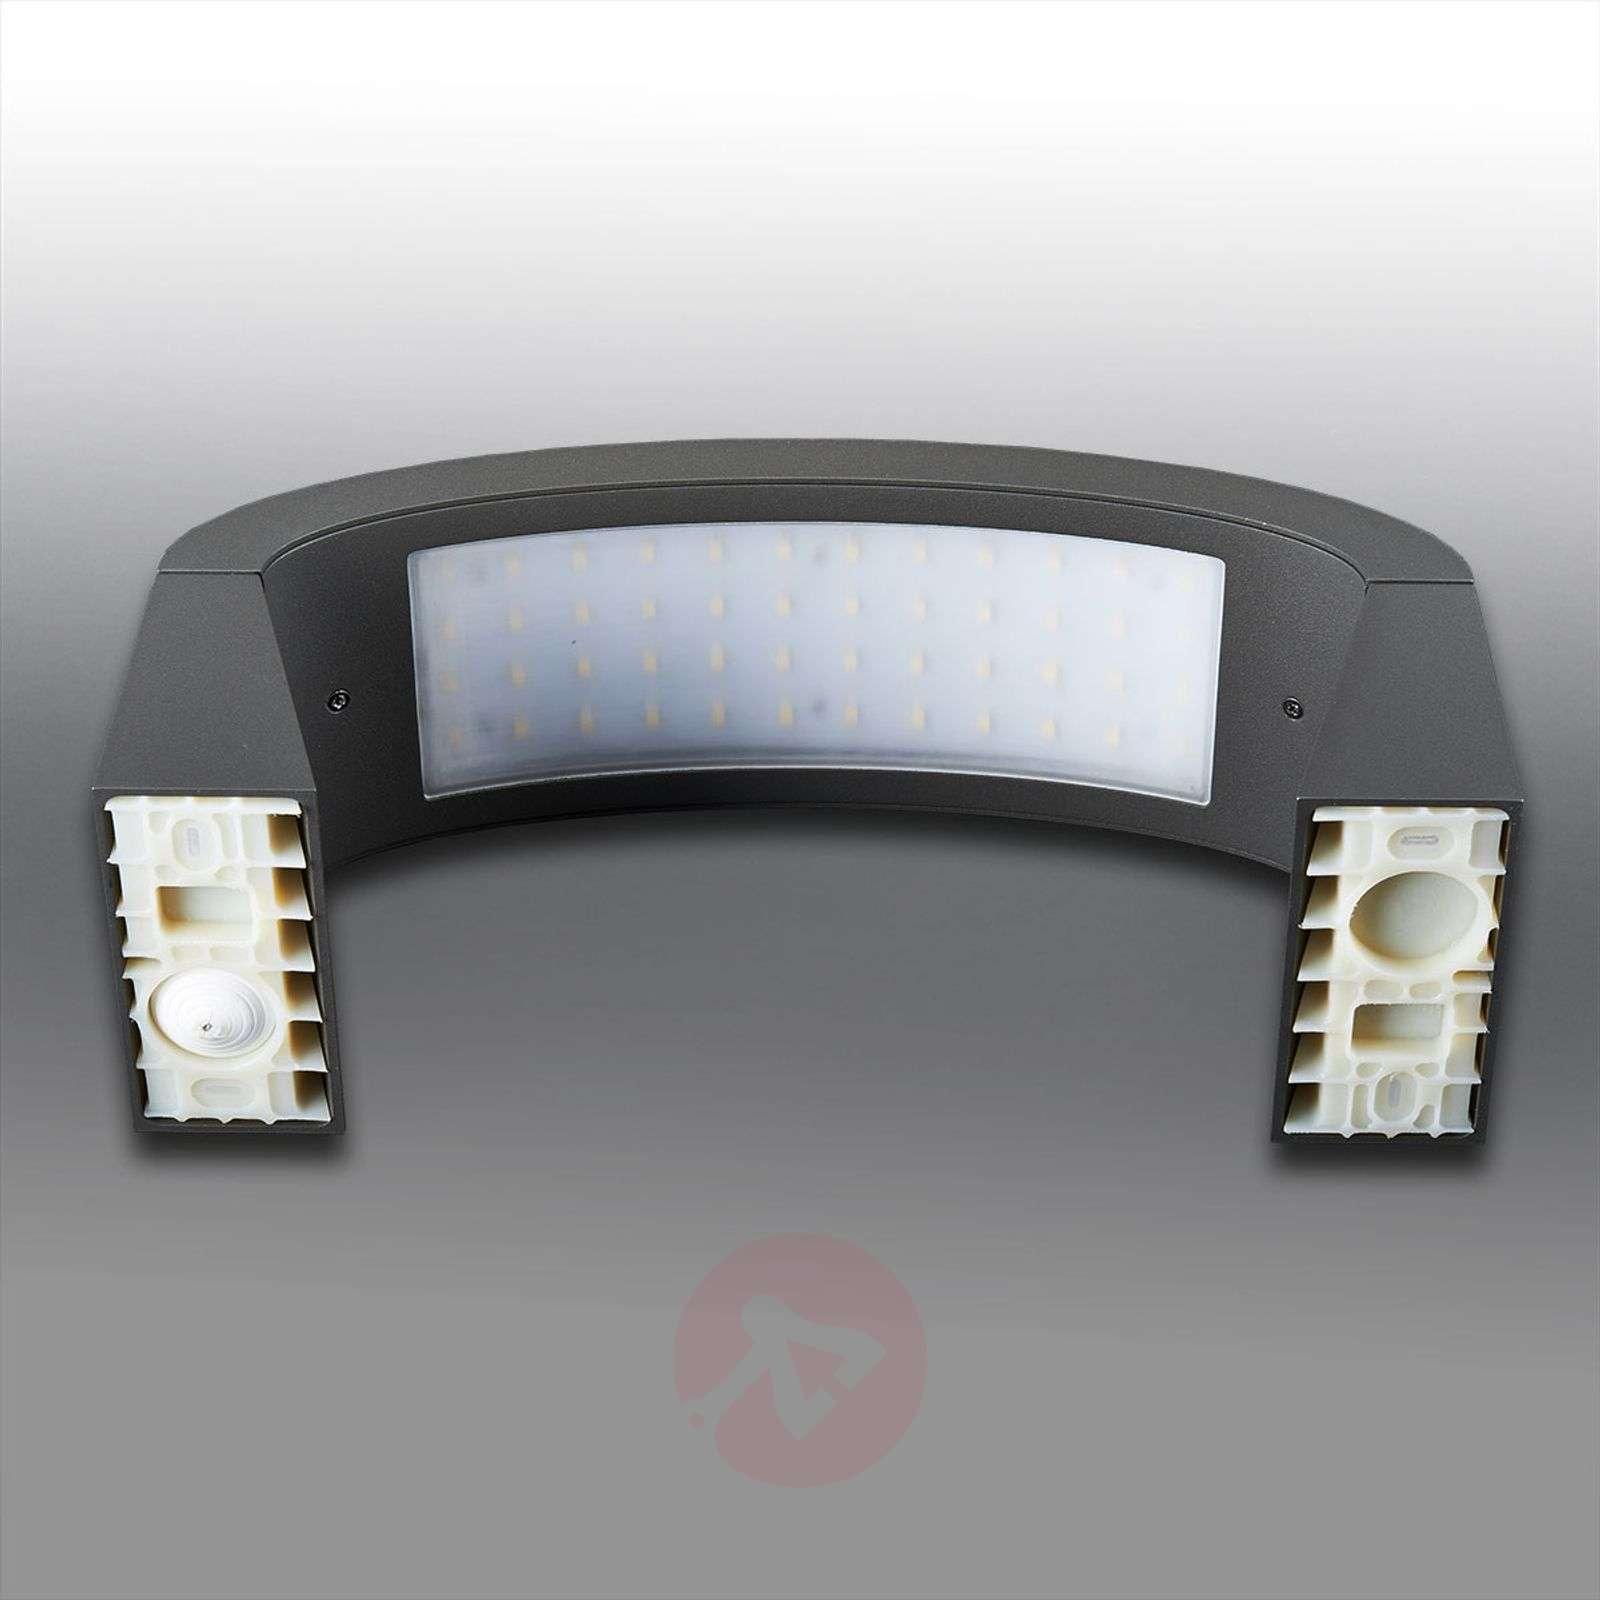 Peppa, Elegant LED Exterior Wall Lamp, IP54-9619001-01